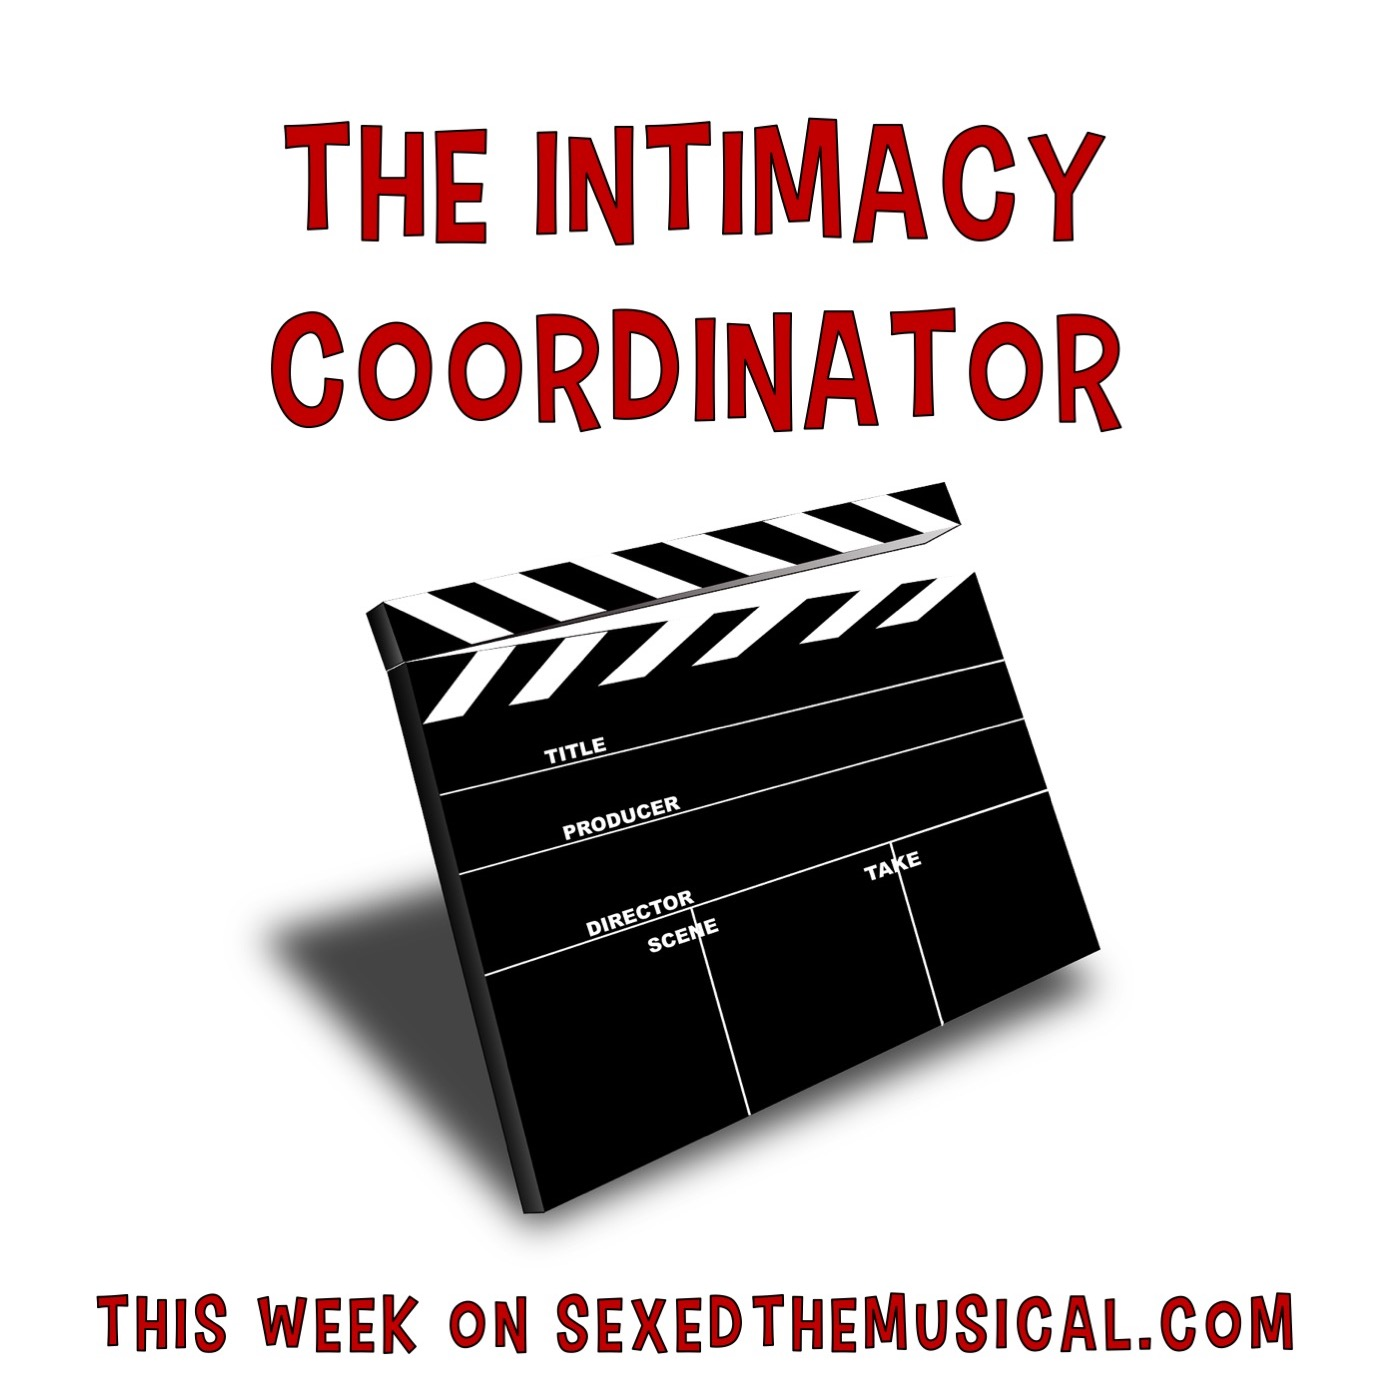 THE INTIMACY COORDINATOR